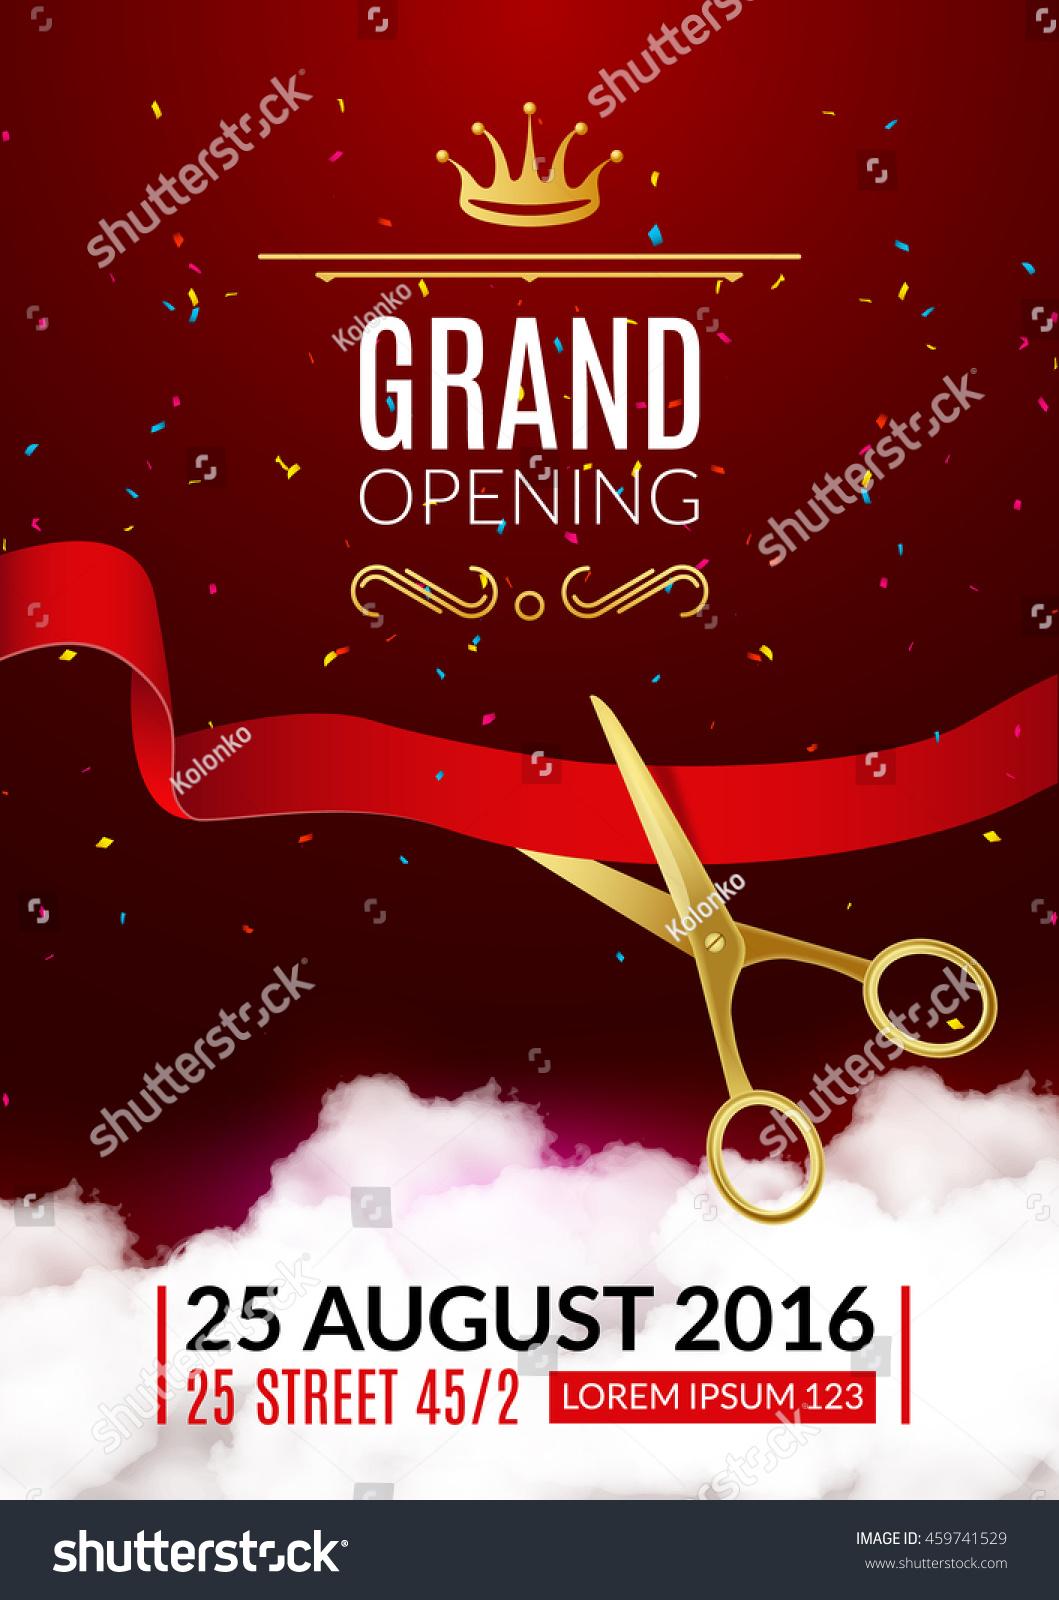 grand opening invitation card grand